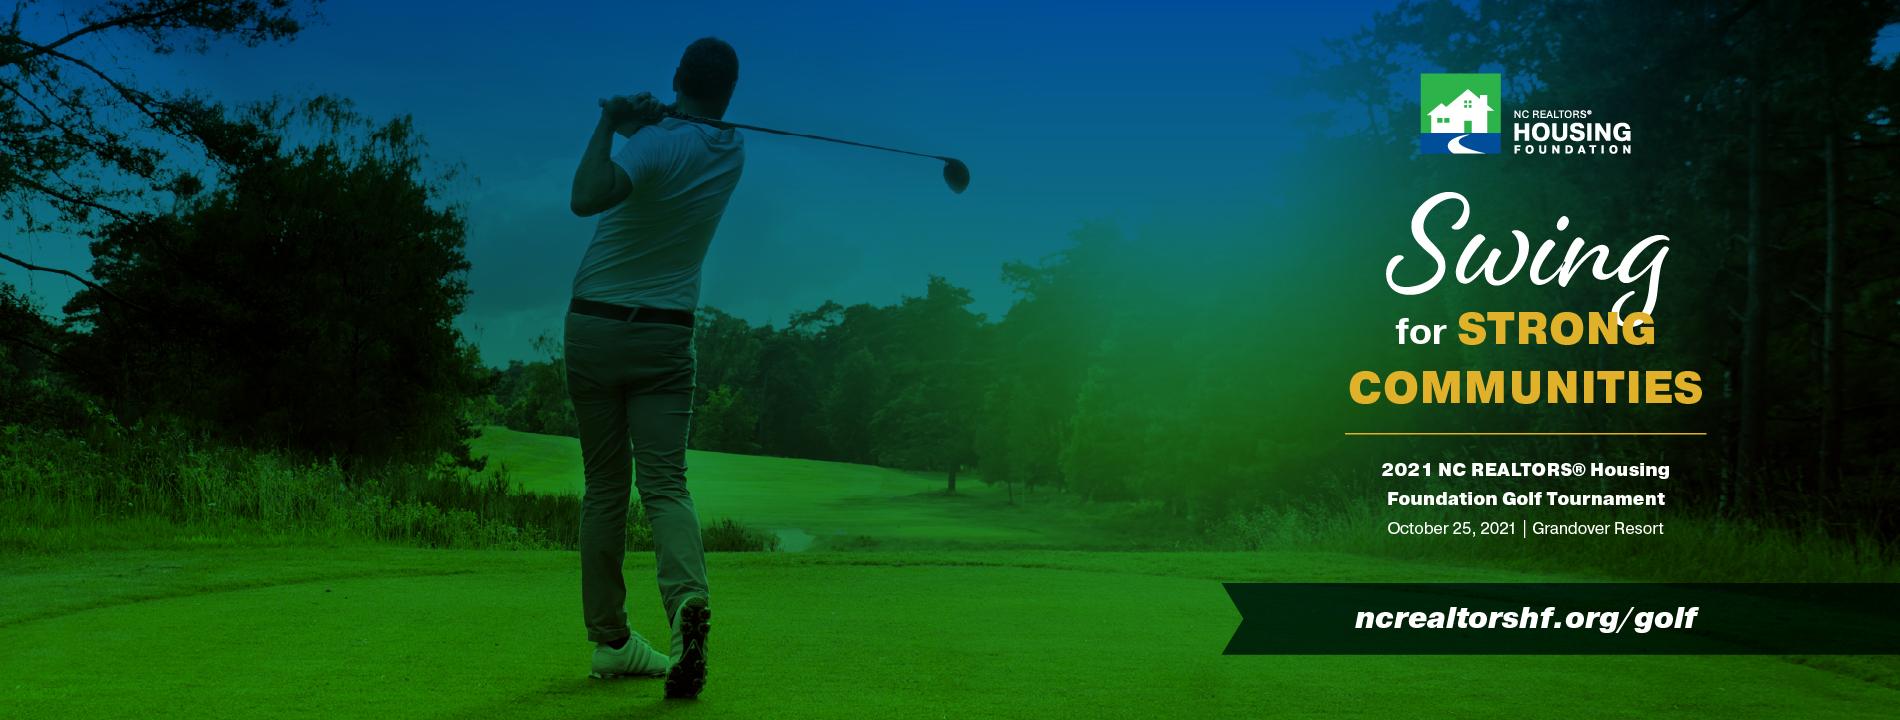 2021 Golf Tournament Swing Website Slider